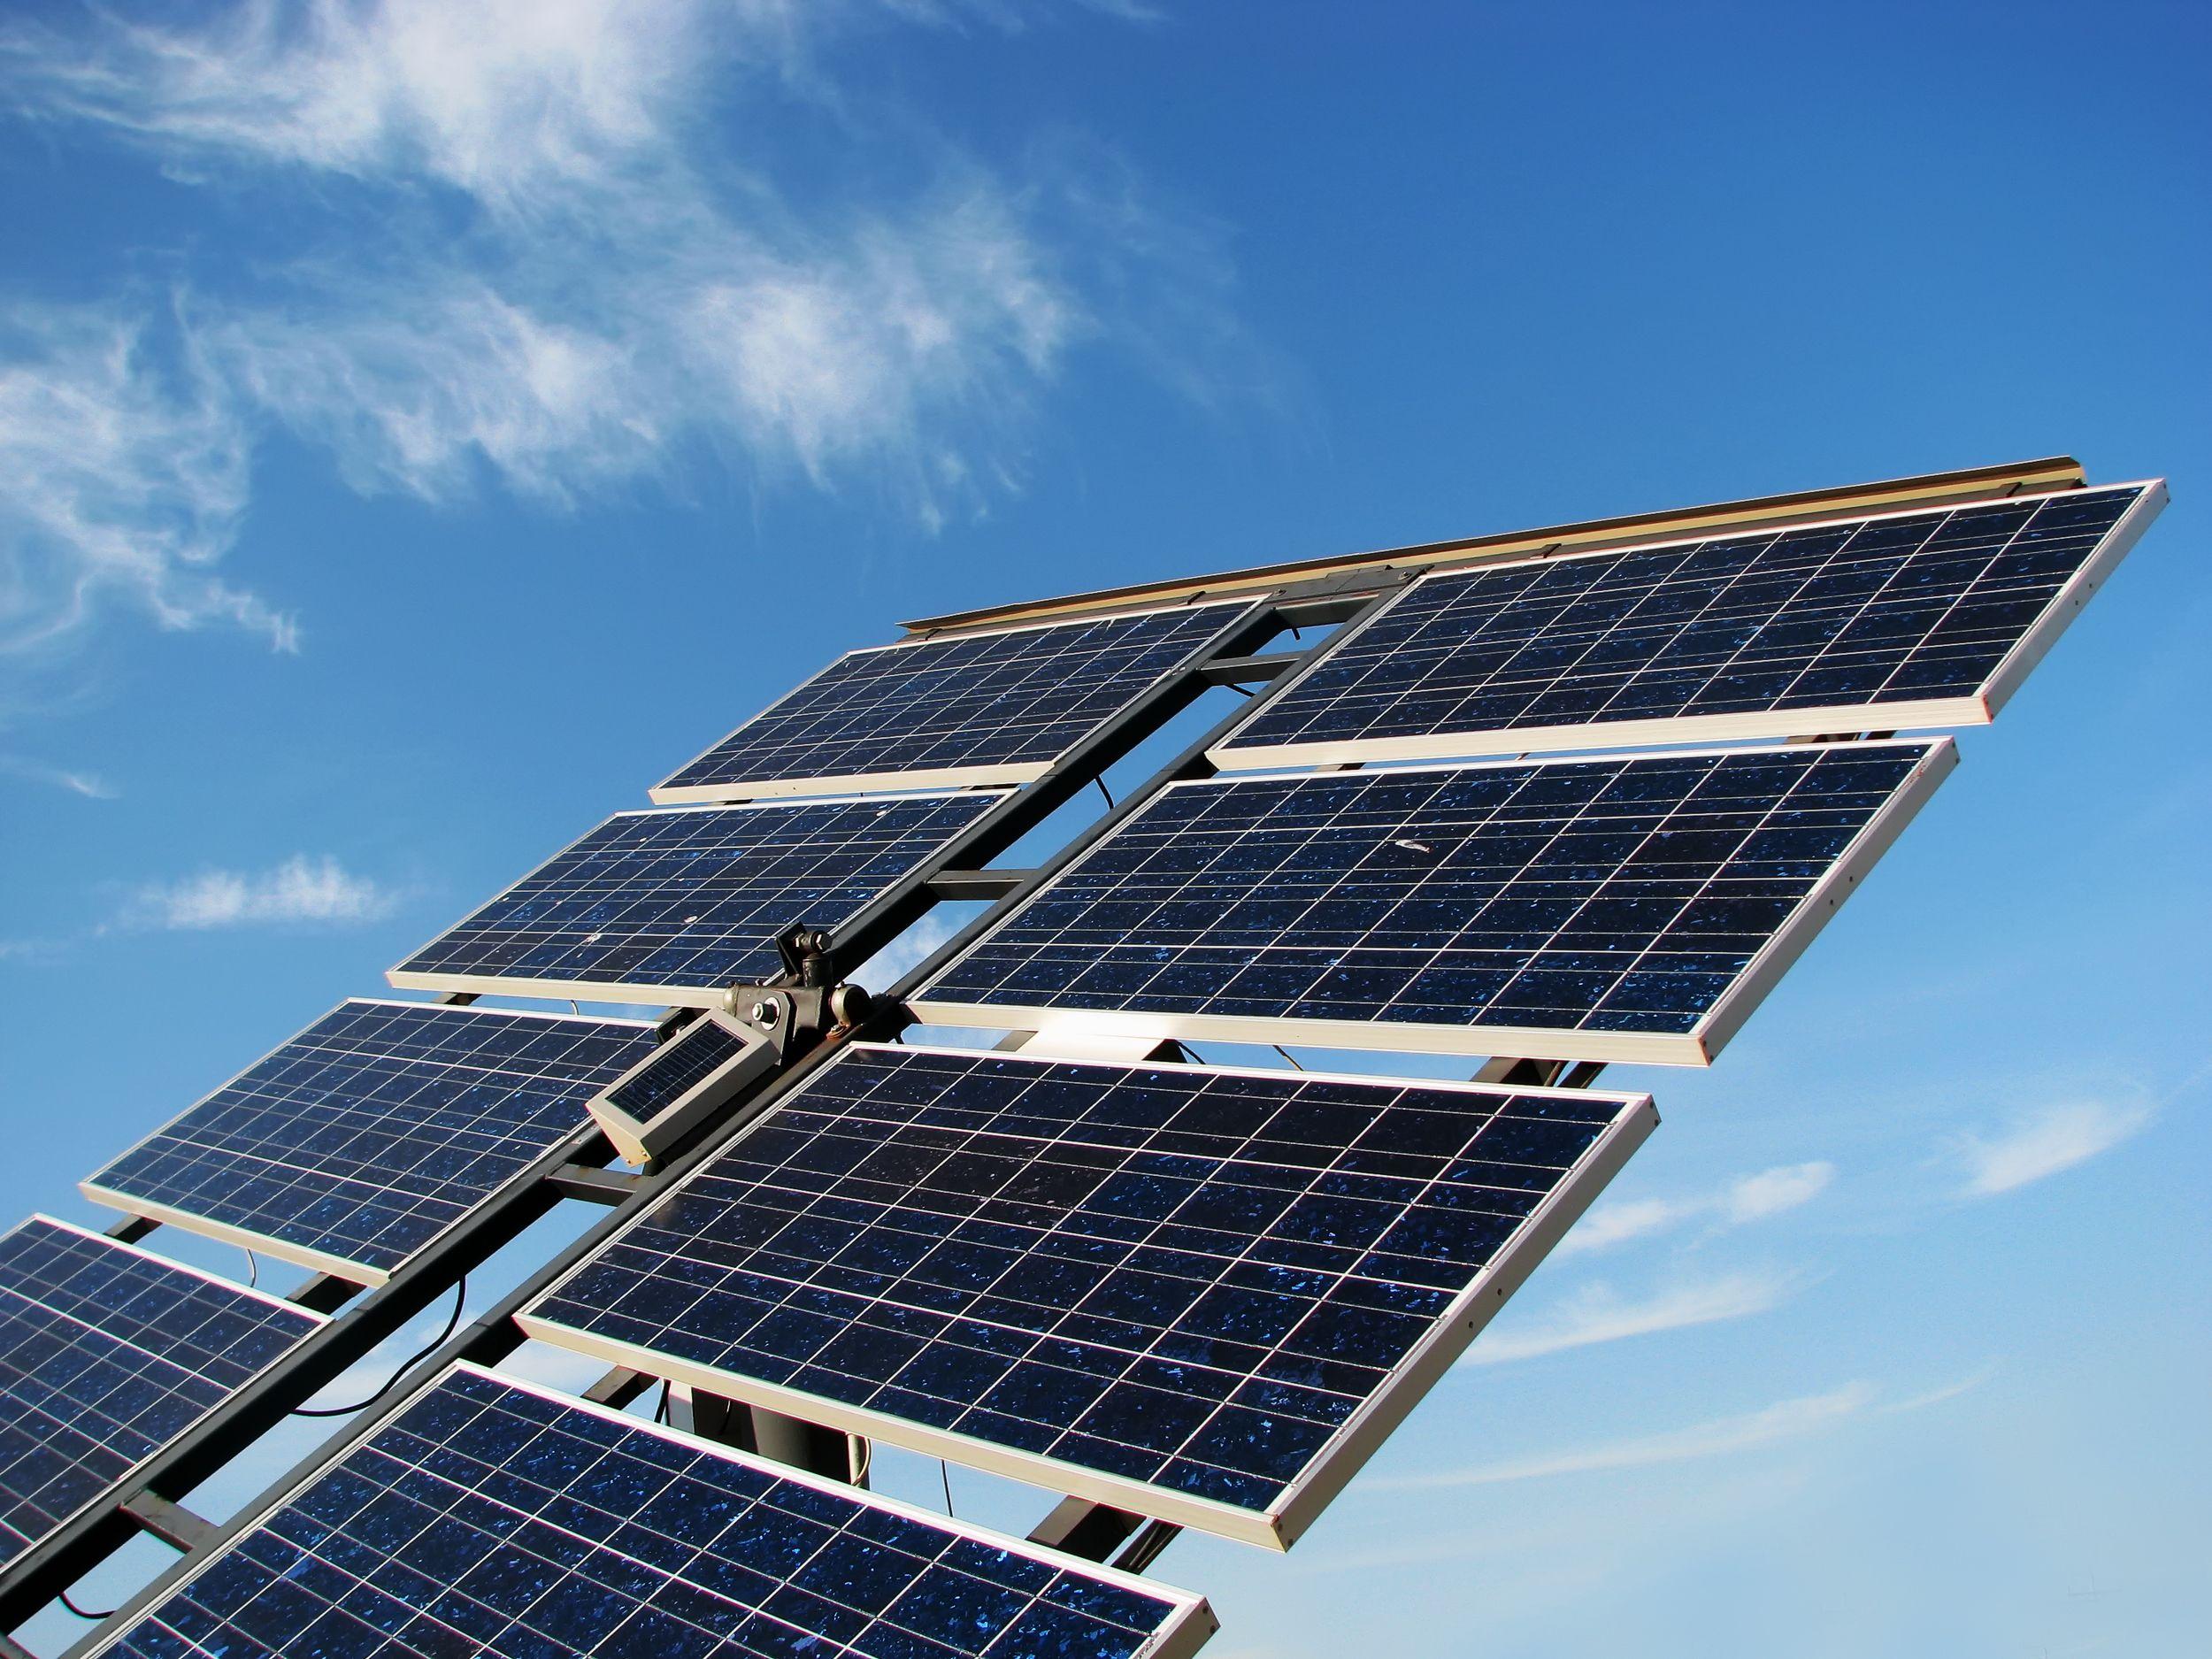 Balers And Comapctors Fueled By The Sun Harmony Enterprises Solar Panel Cost Solar Panels Best Solar Panels